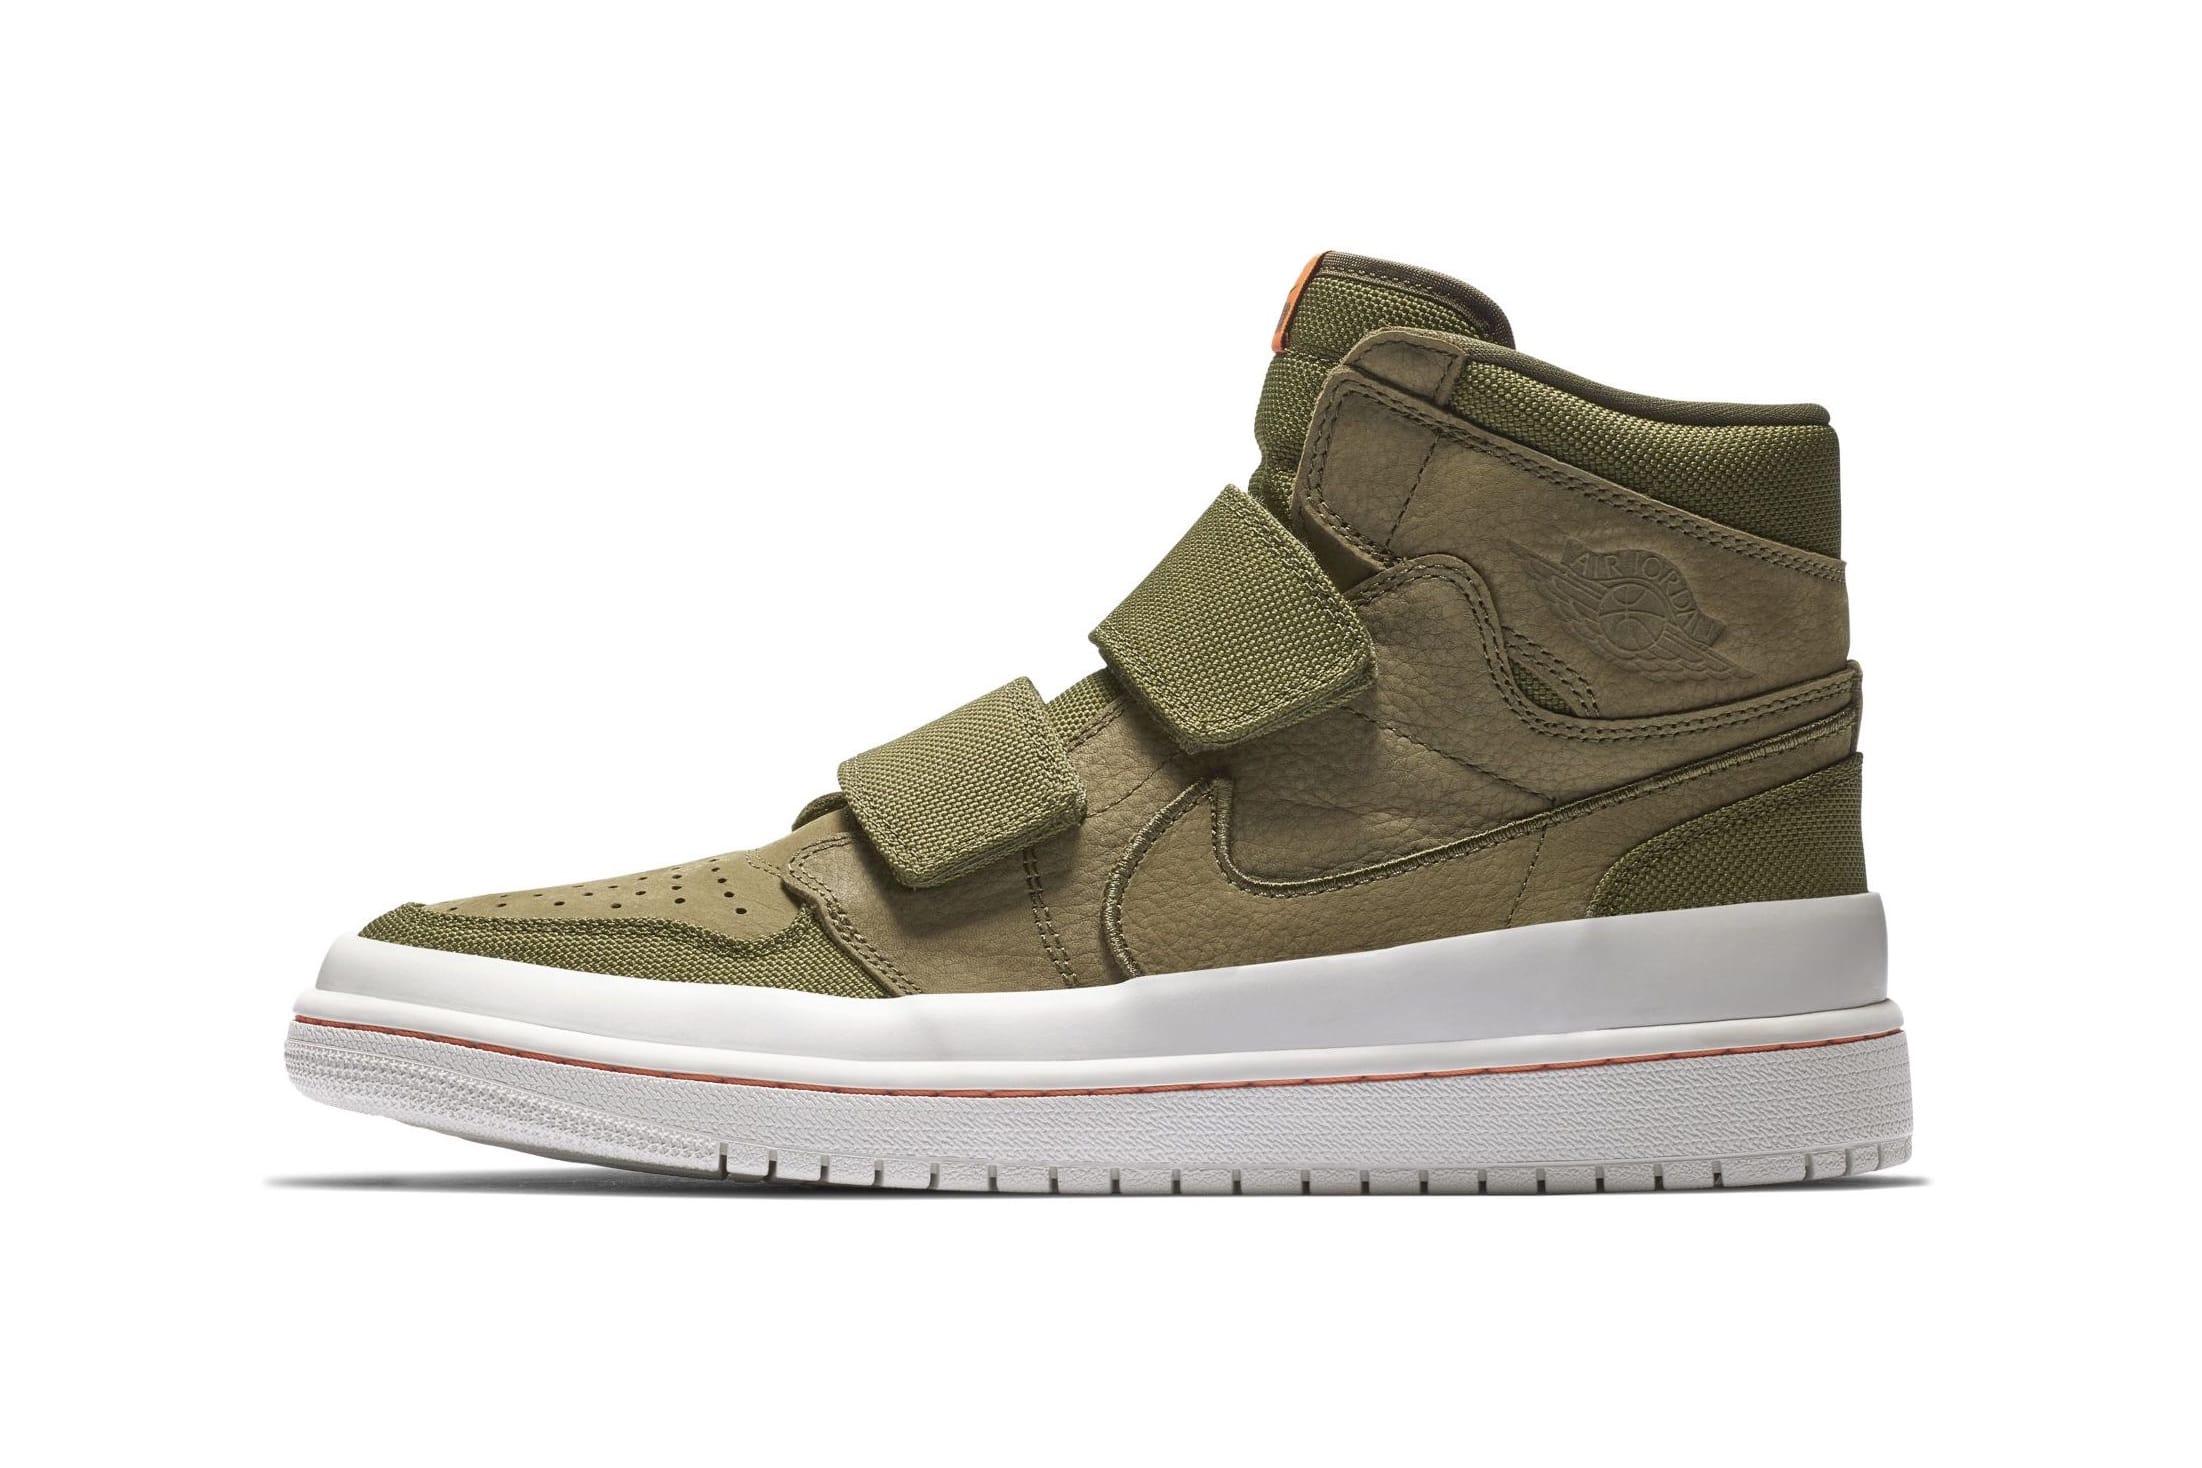 Air Jordan 1 High Double Strap Olive